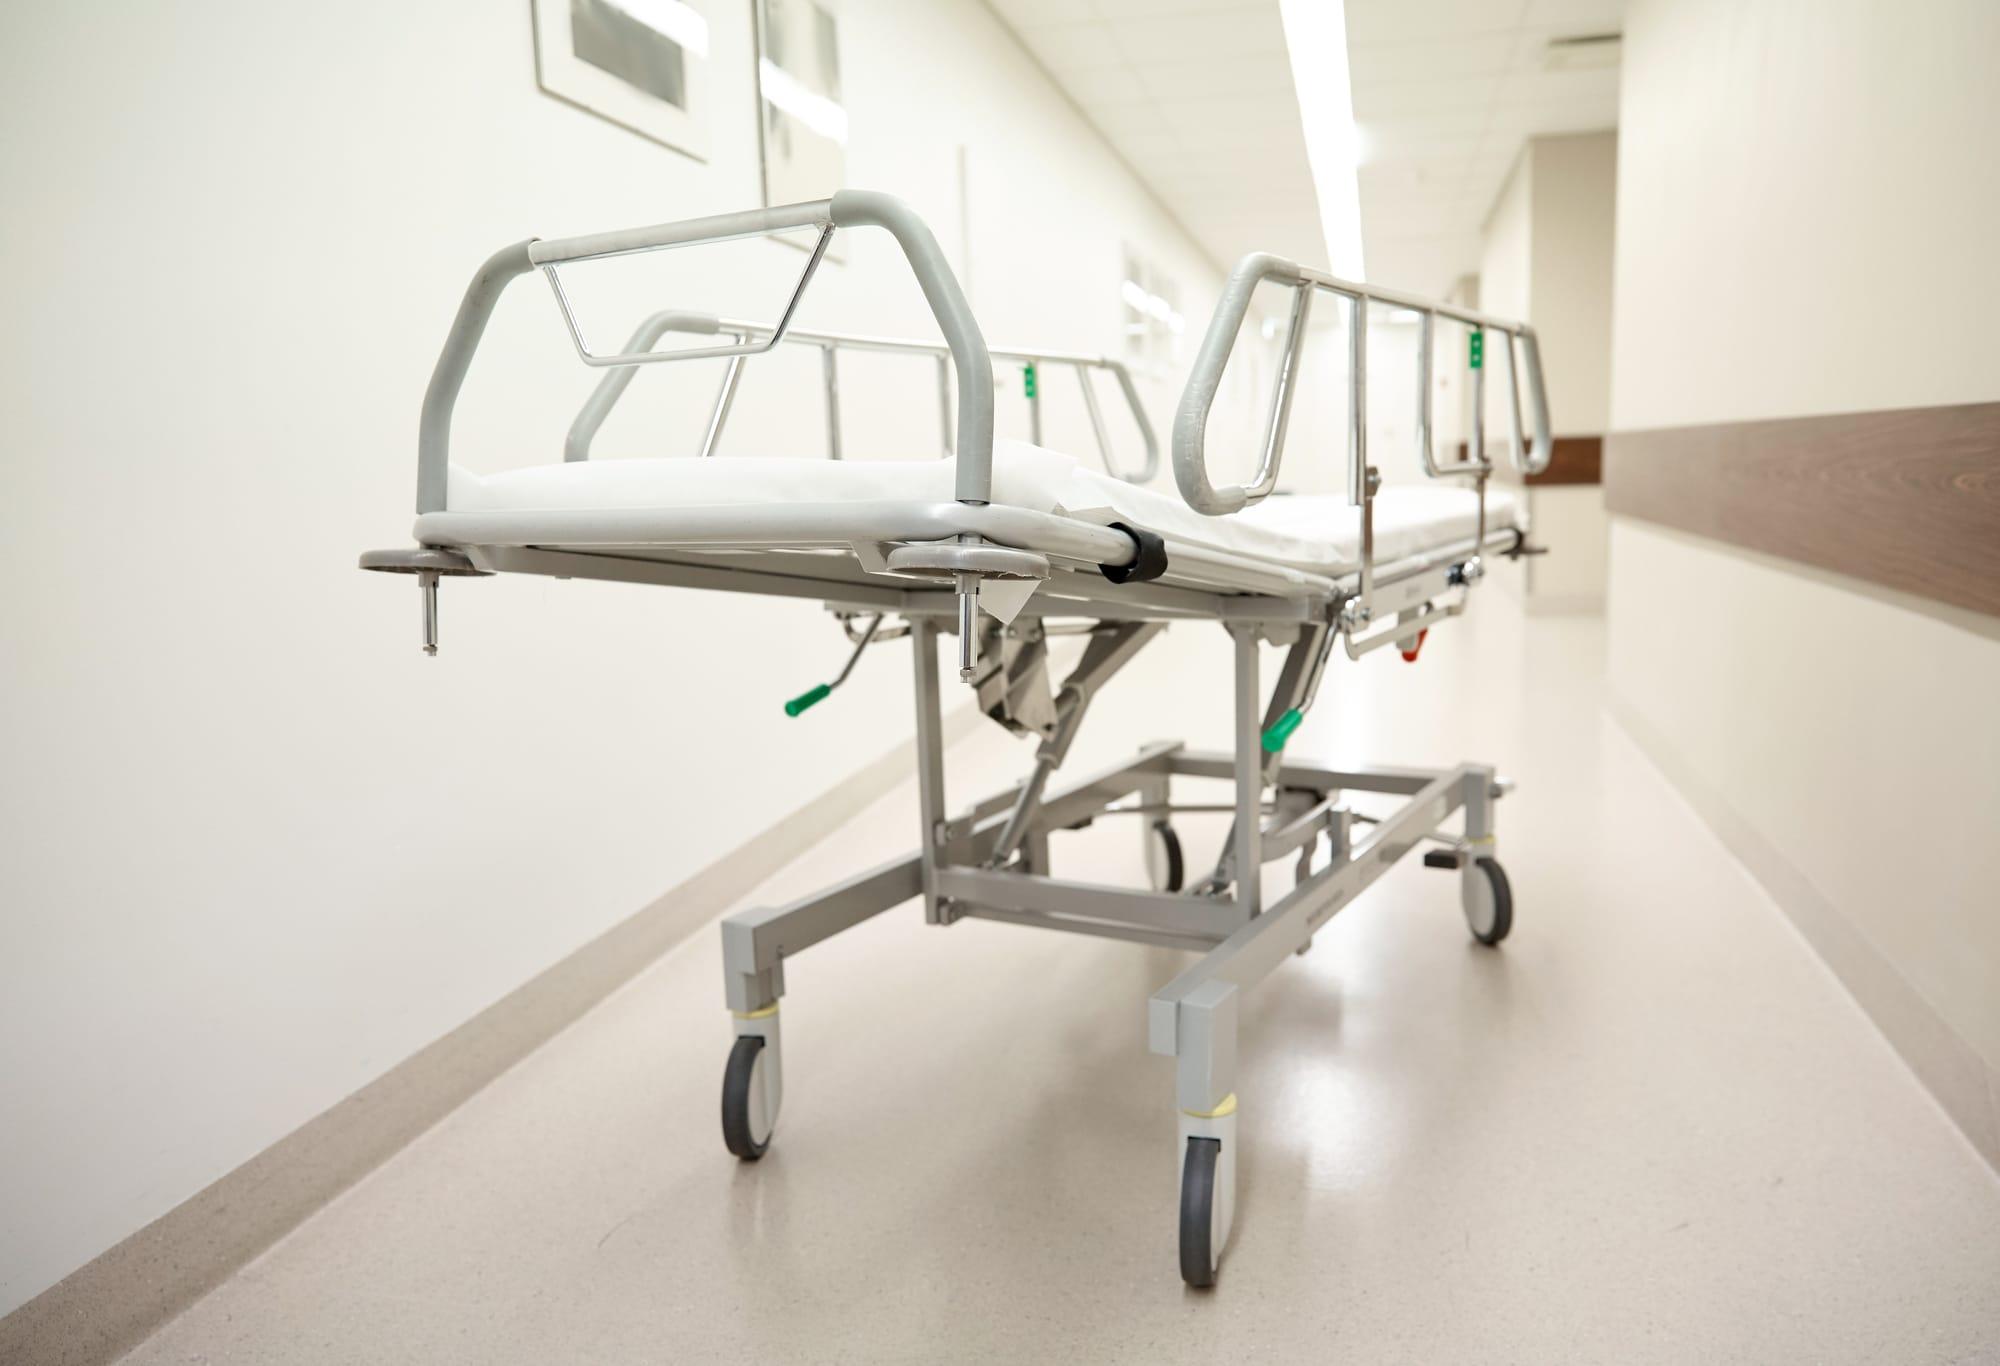 empty gurney in hospital corridor